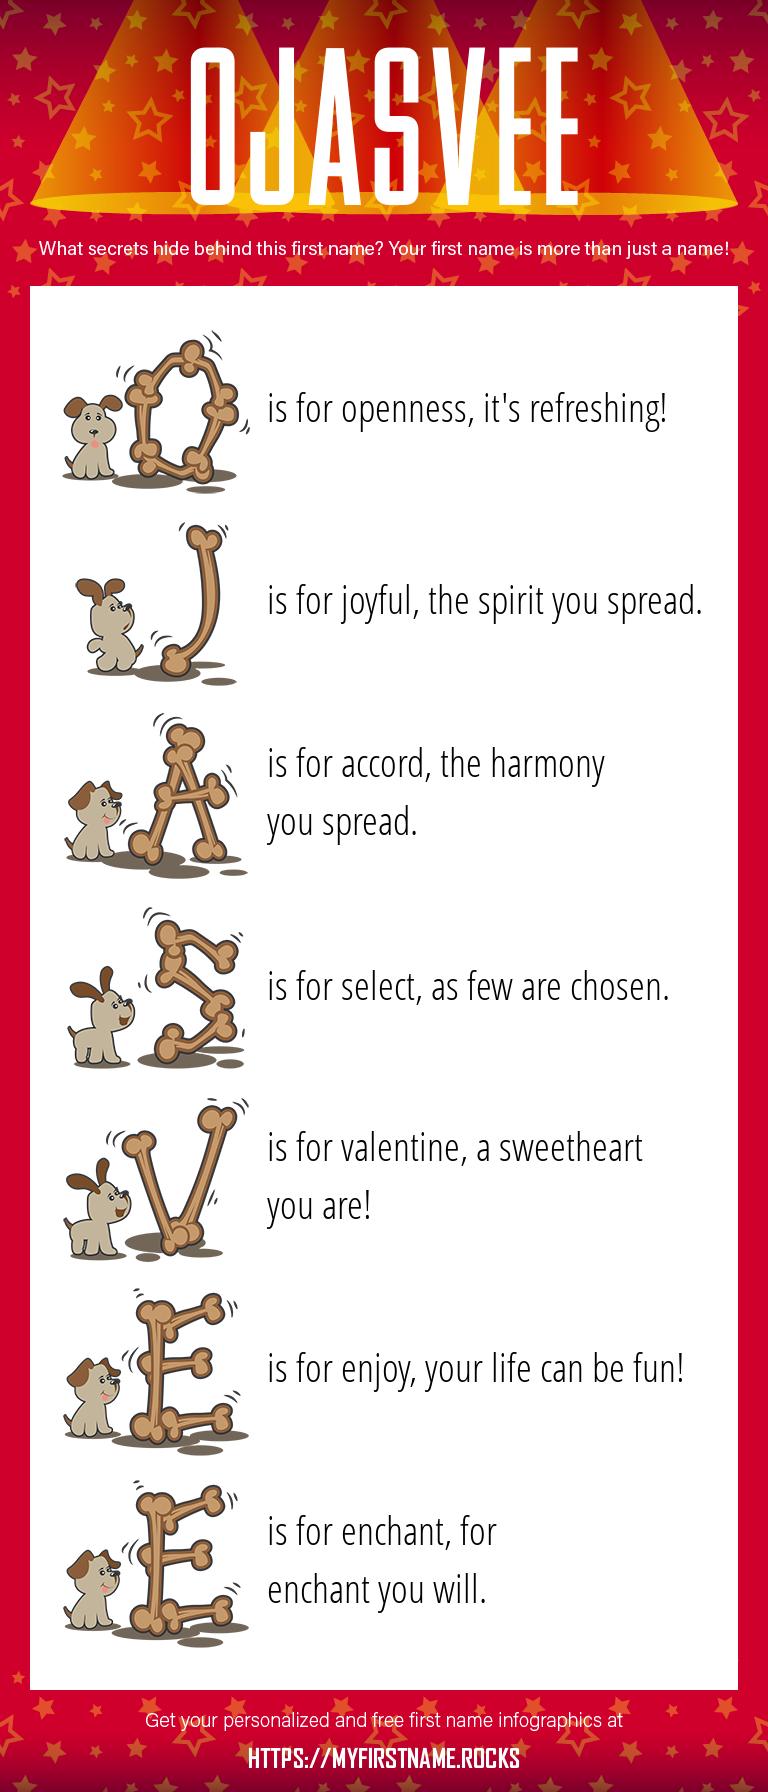 Ojasvee Infographics